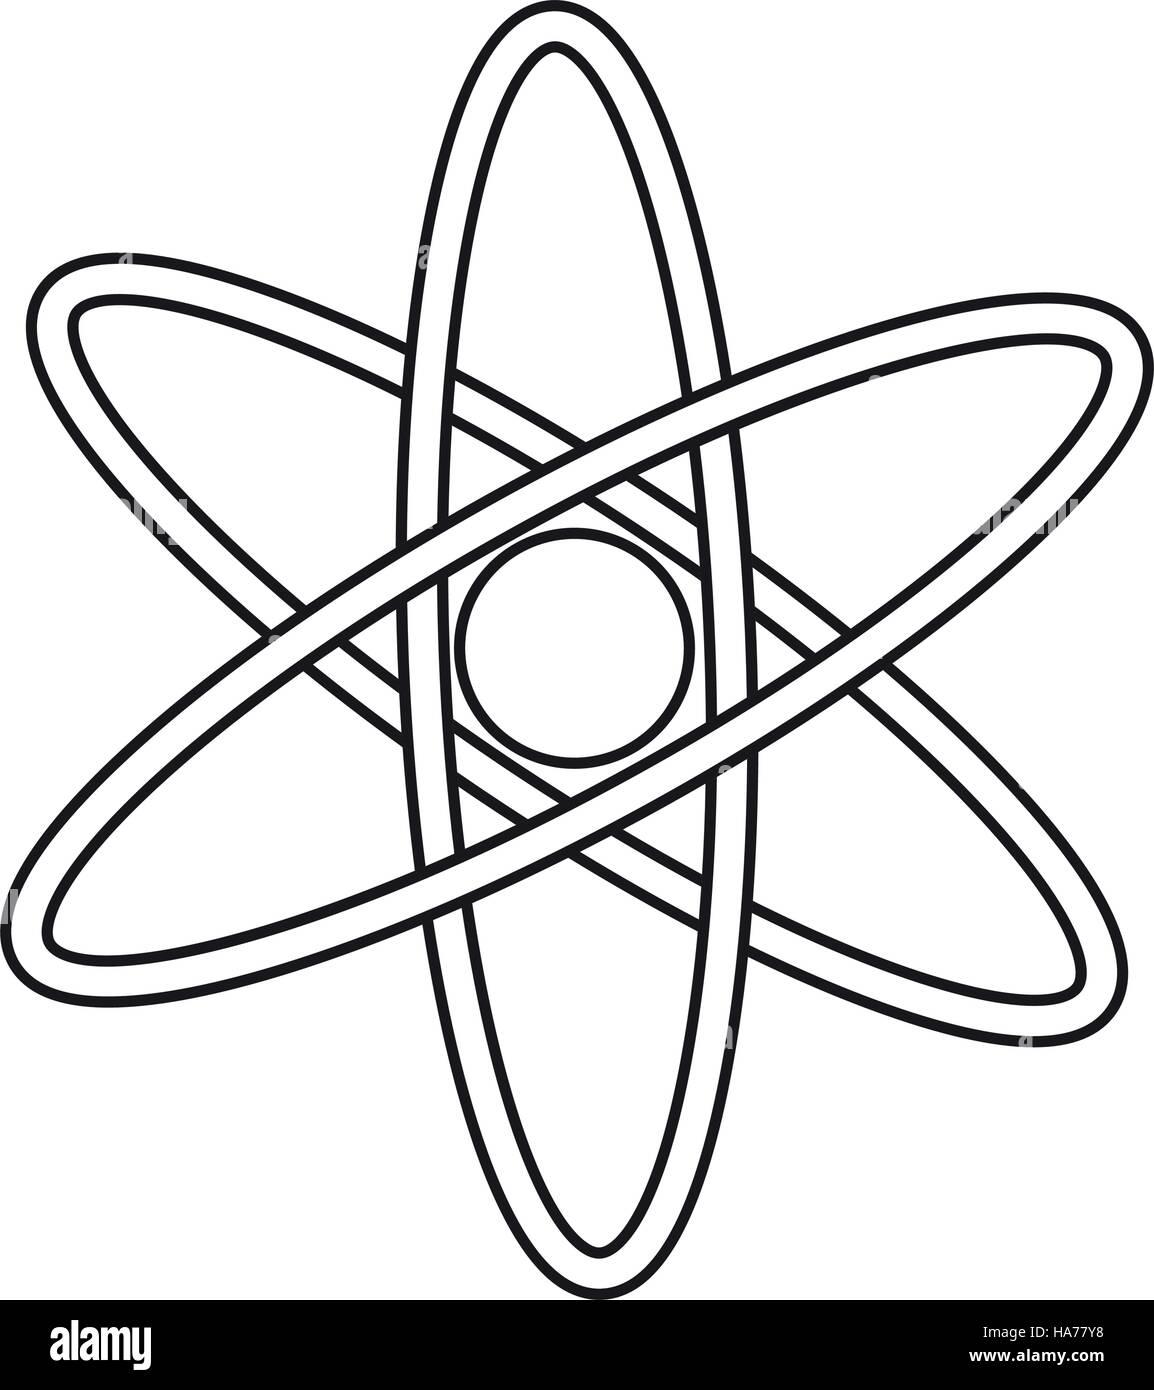 atom molecule structure model pictograph - Stock Image